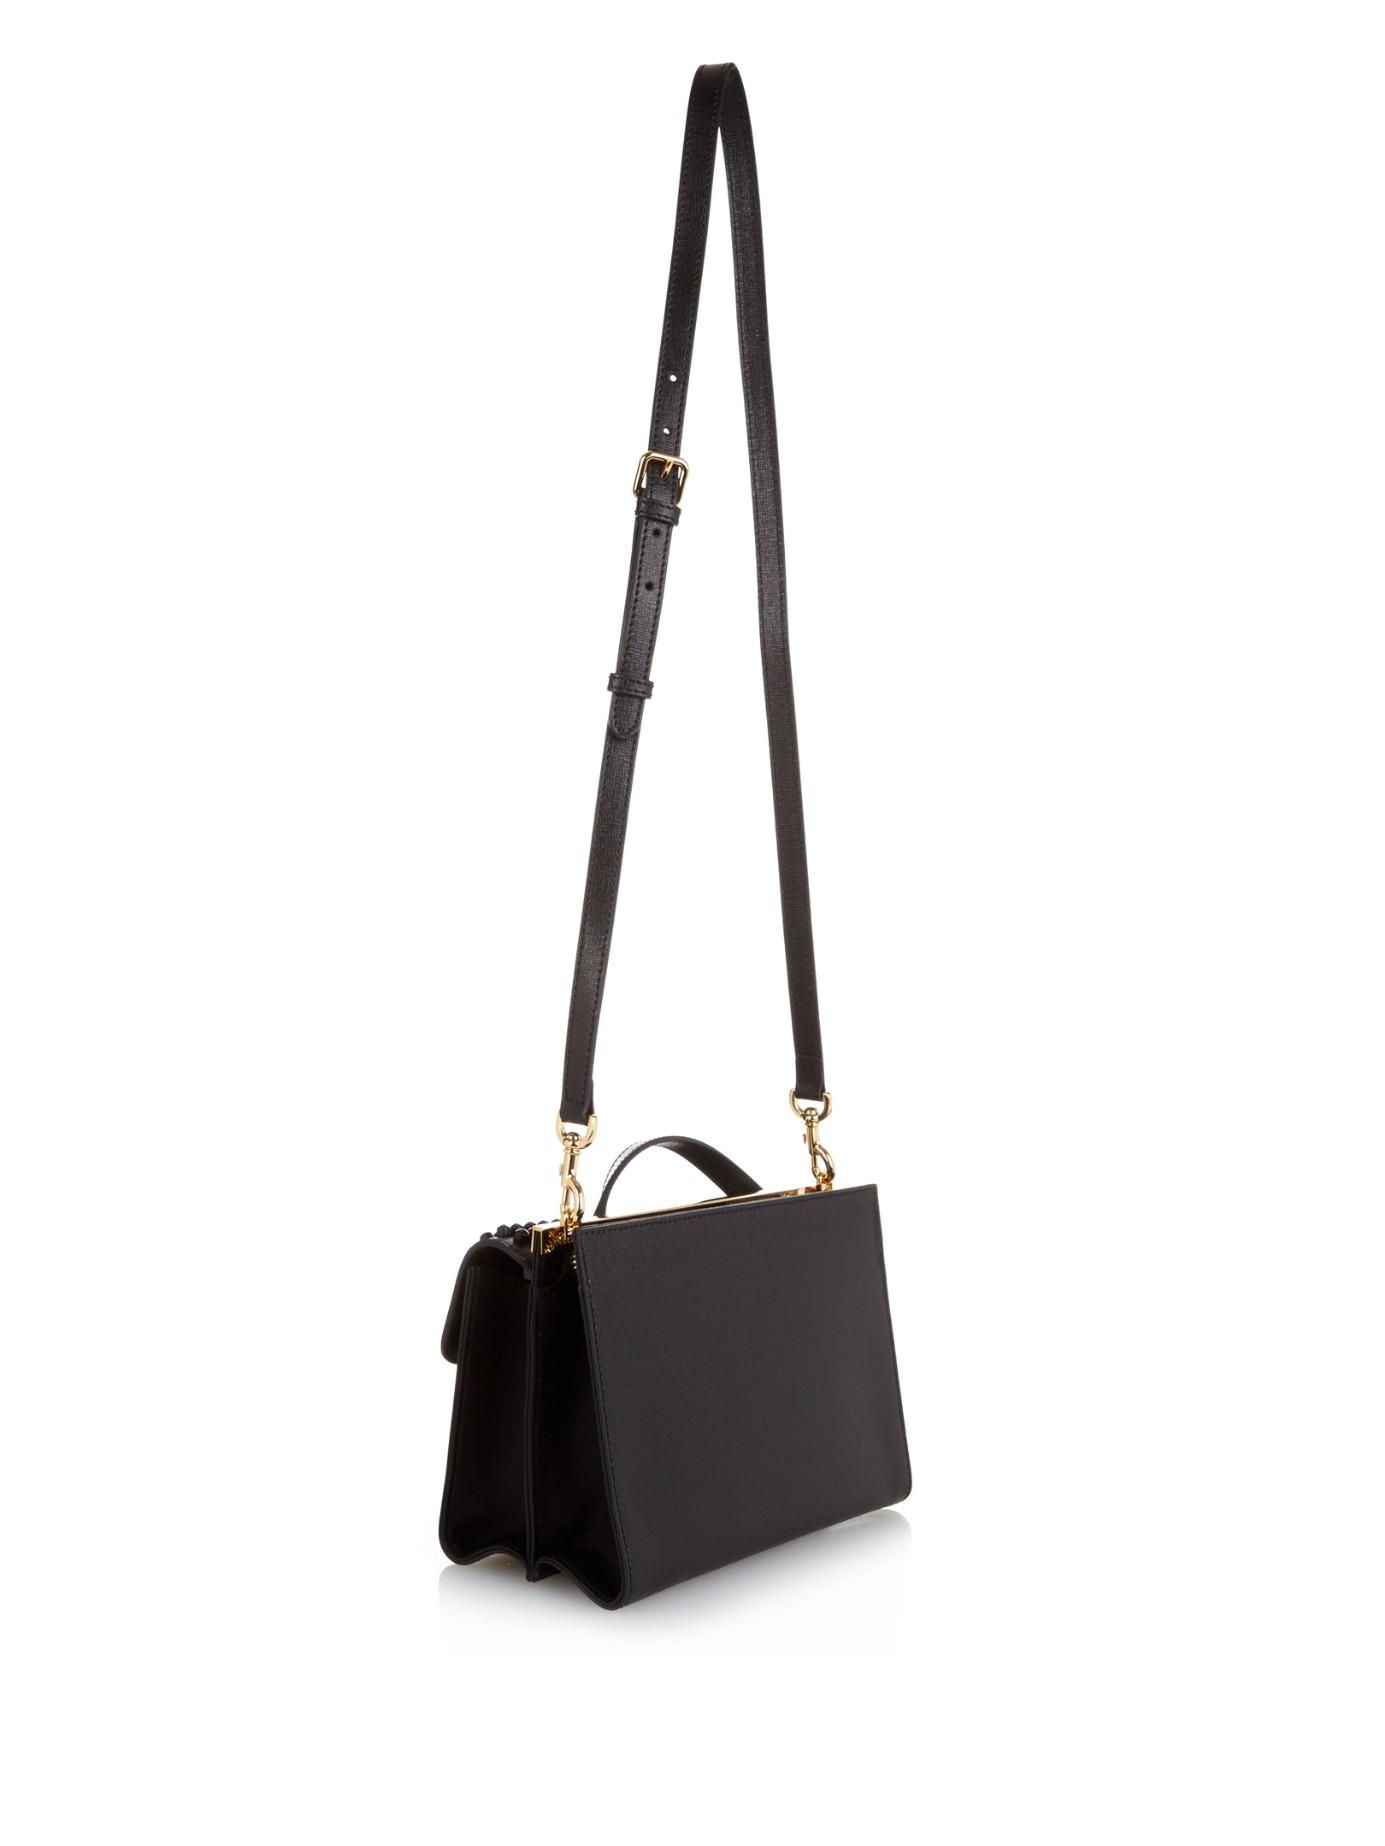 a2bd8c293da8 ... spain lyst fendi demijour small leather cross body bag in black ecf38  e523d